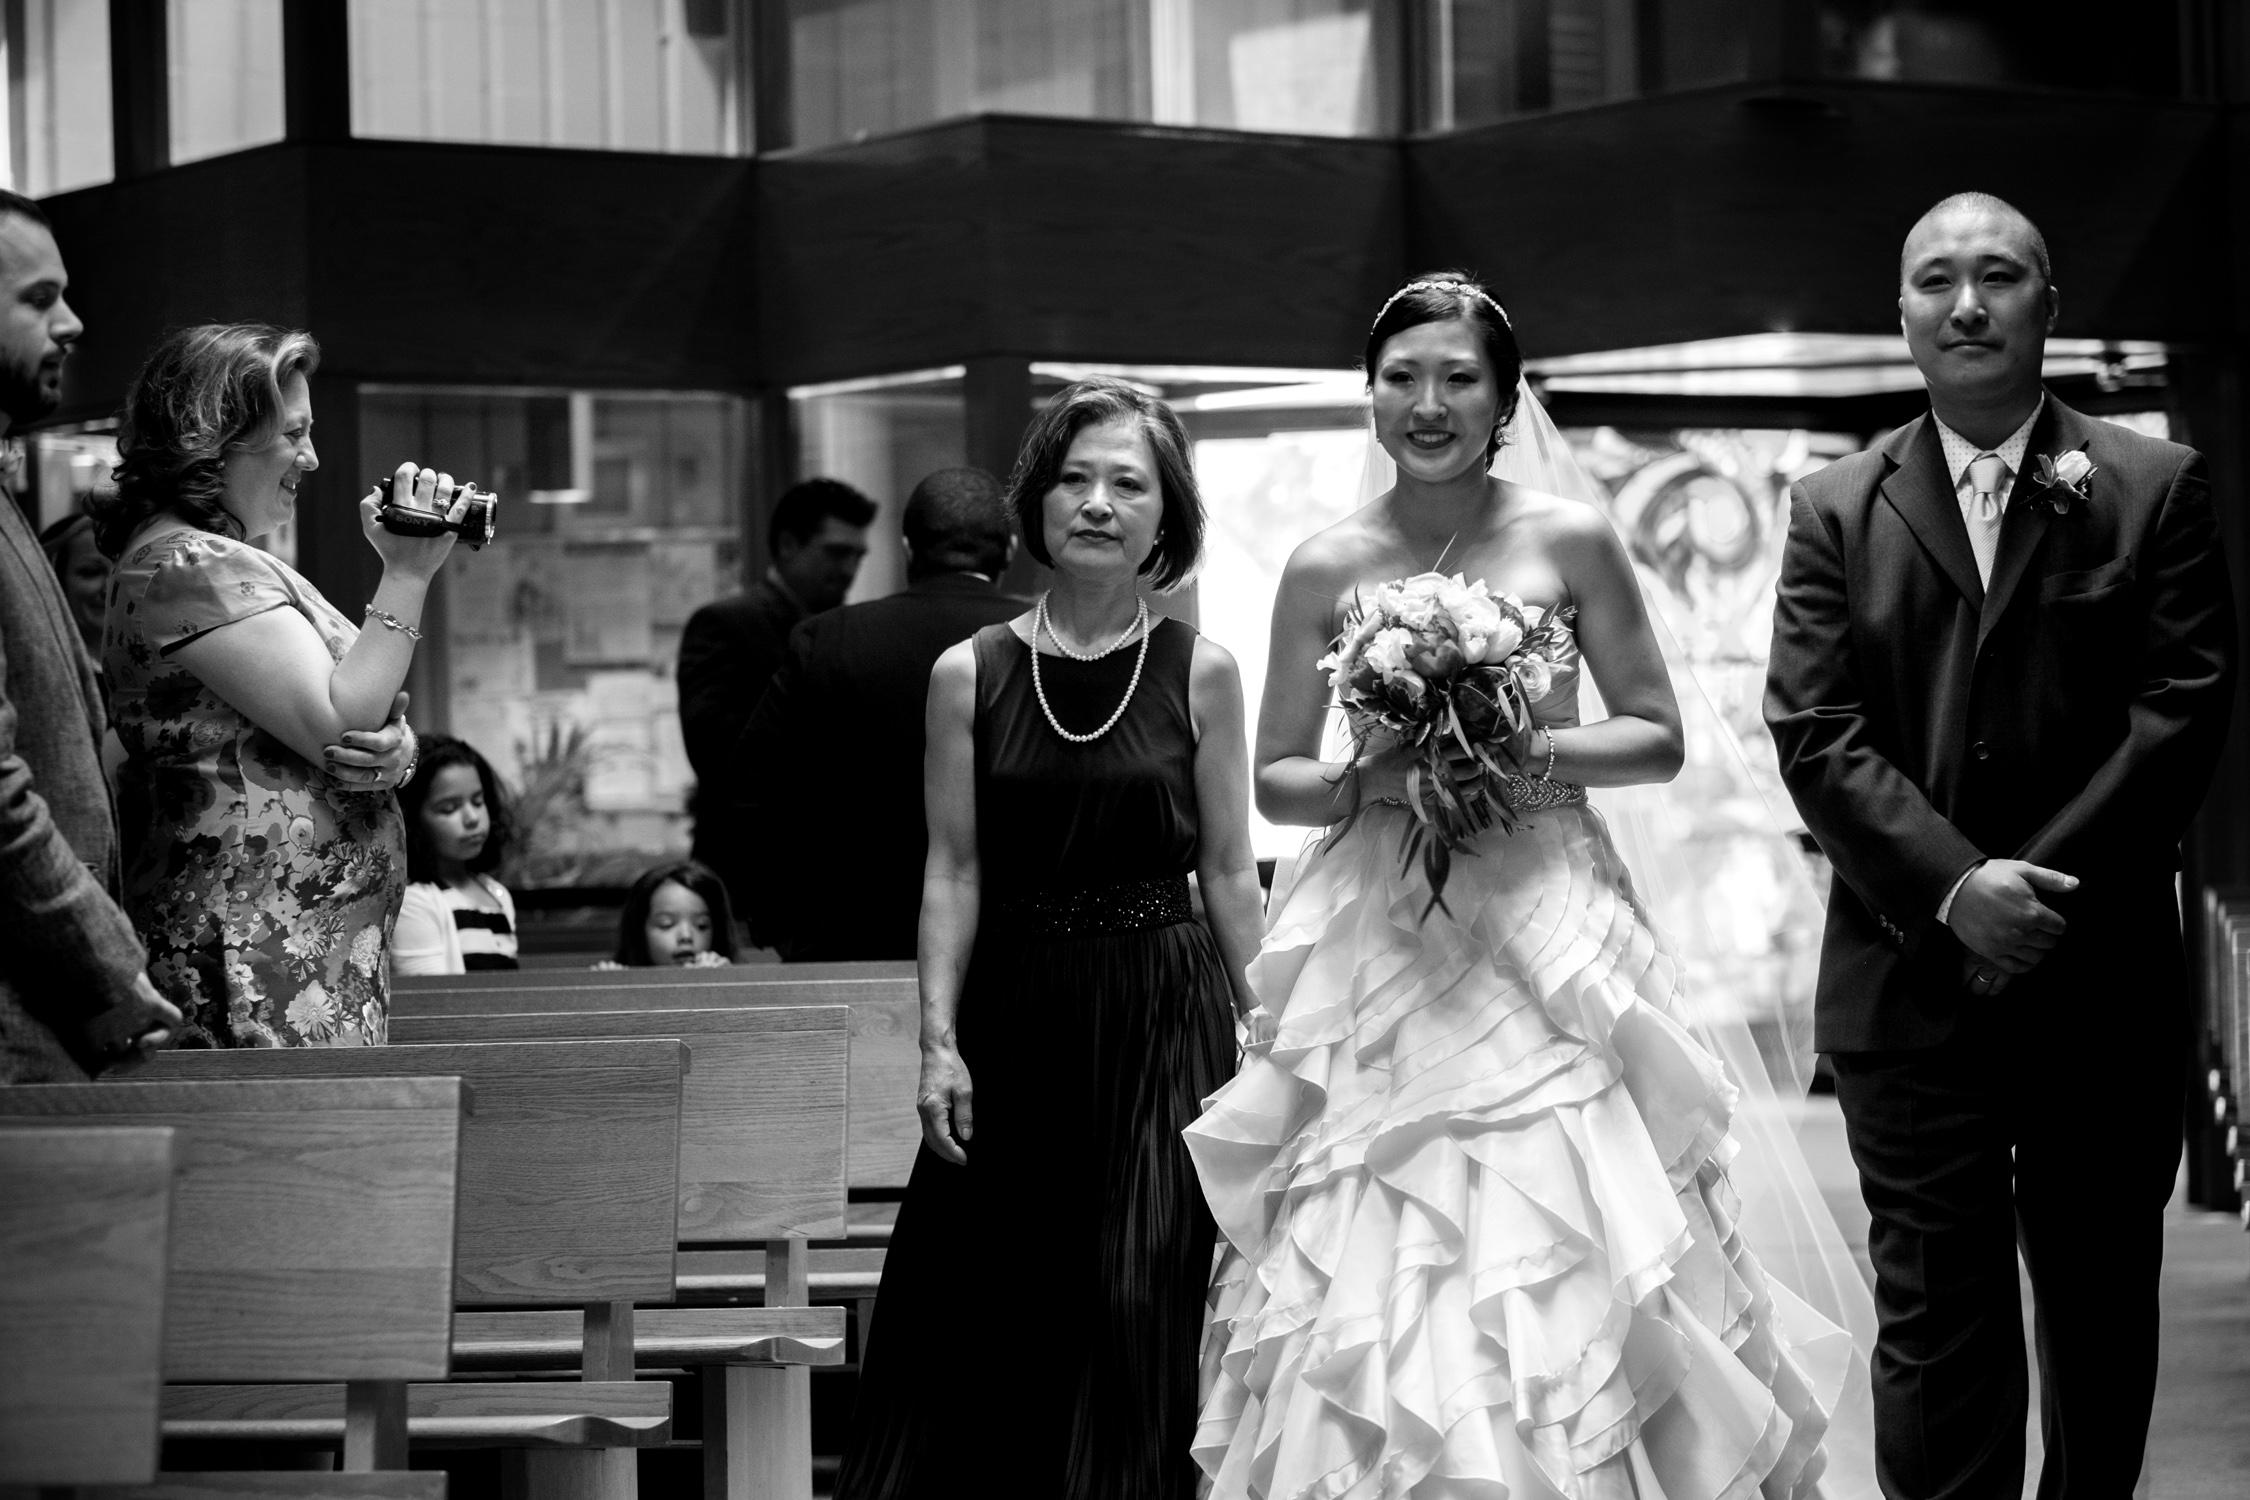 toronto_liberty_grand_wedding-008.jpg